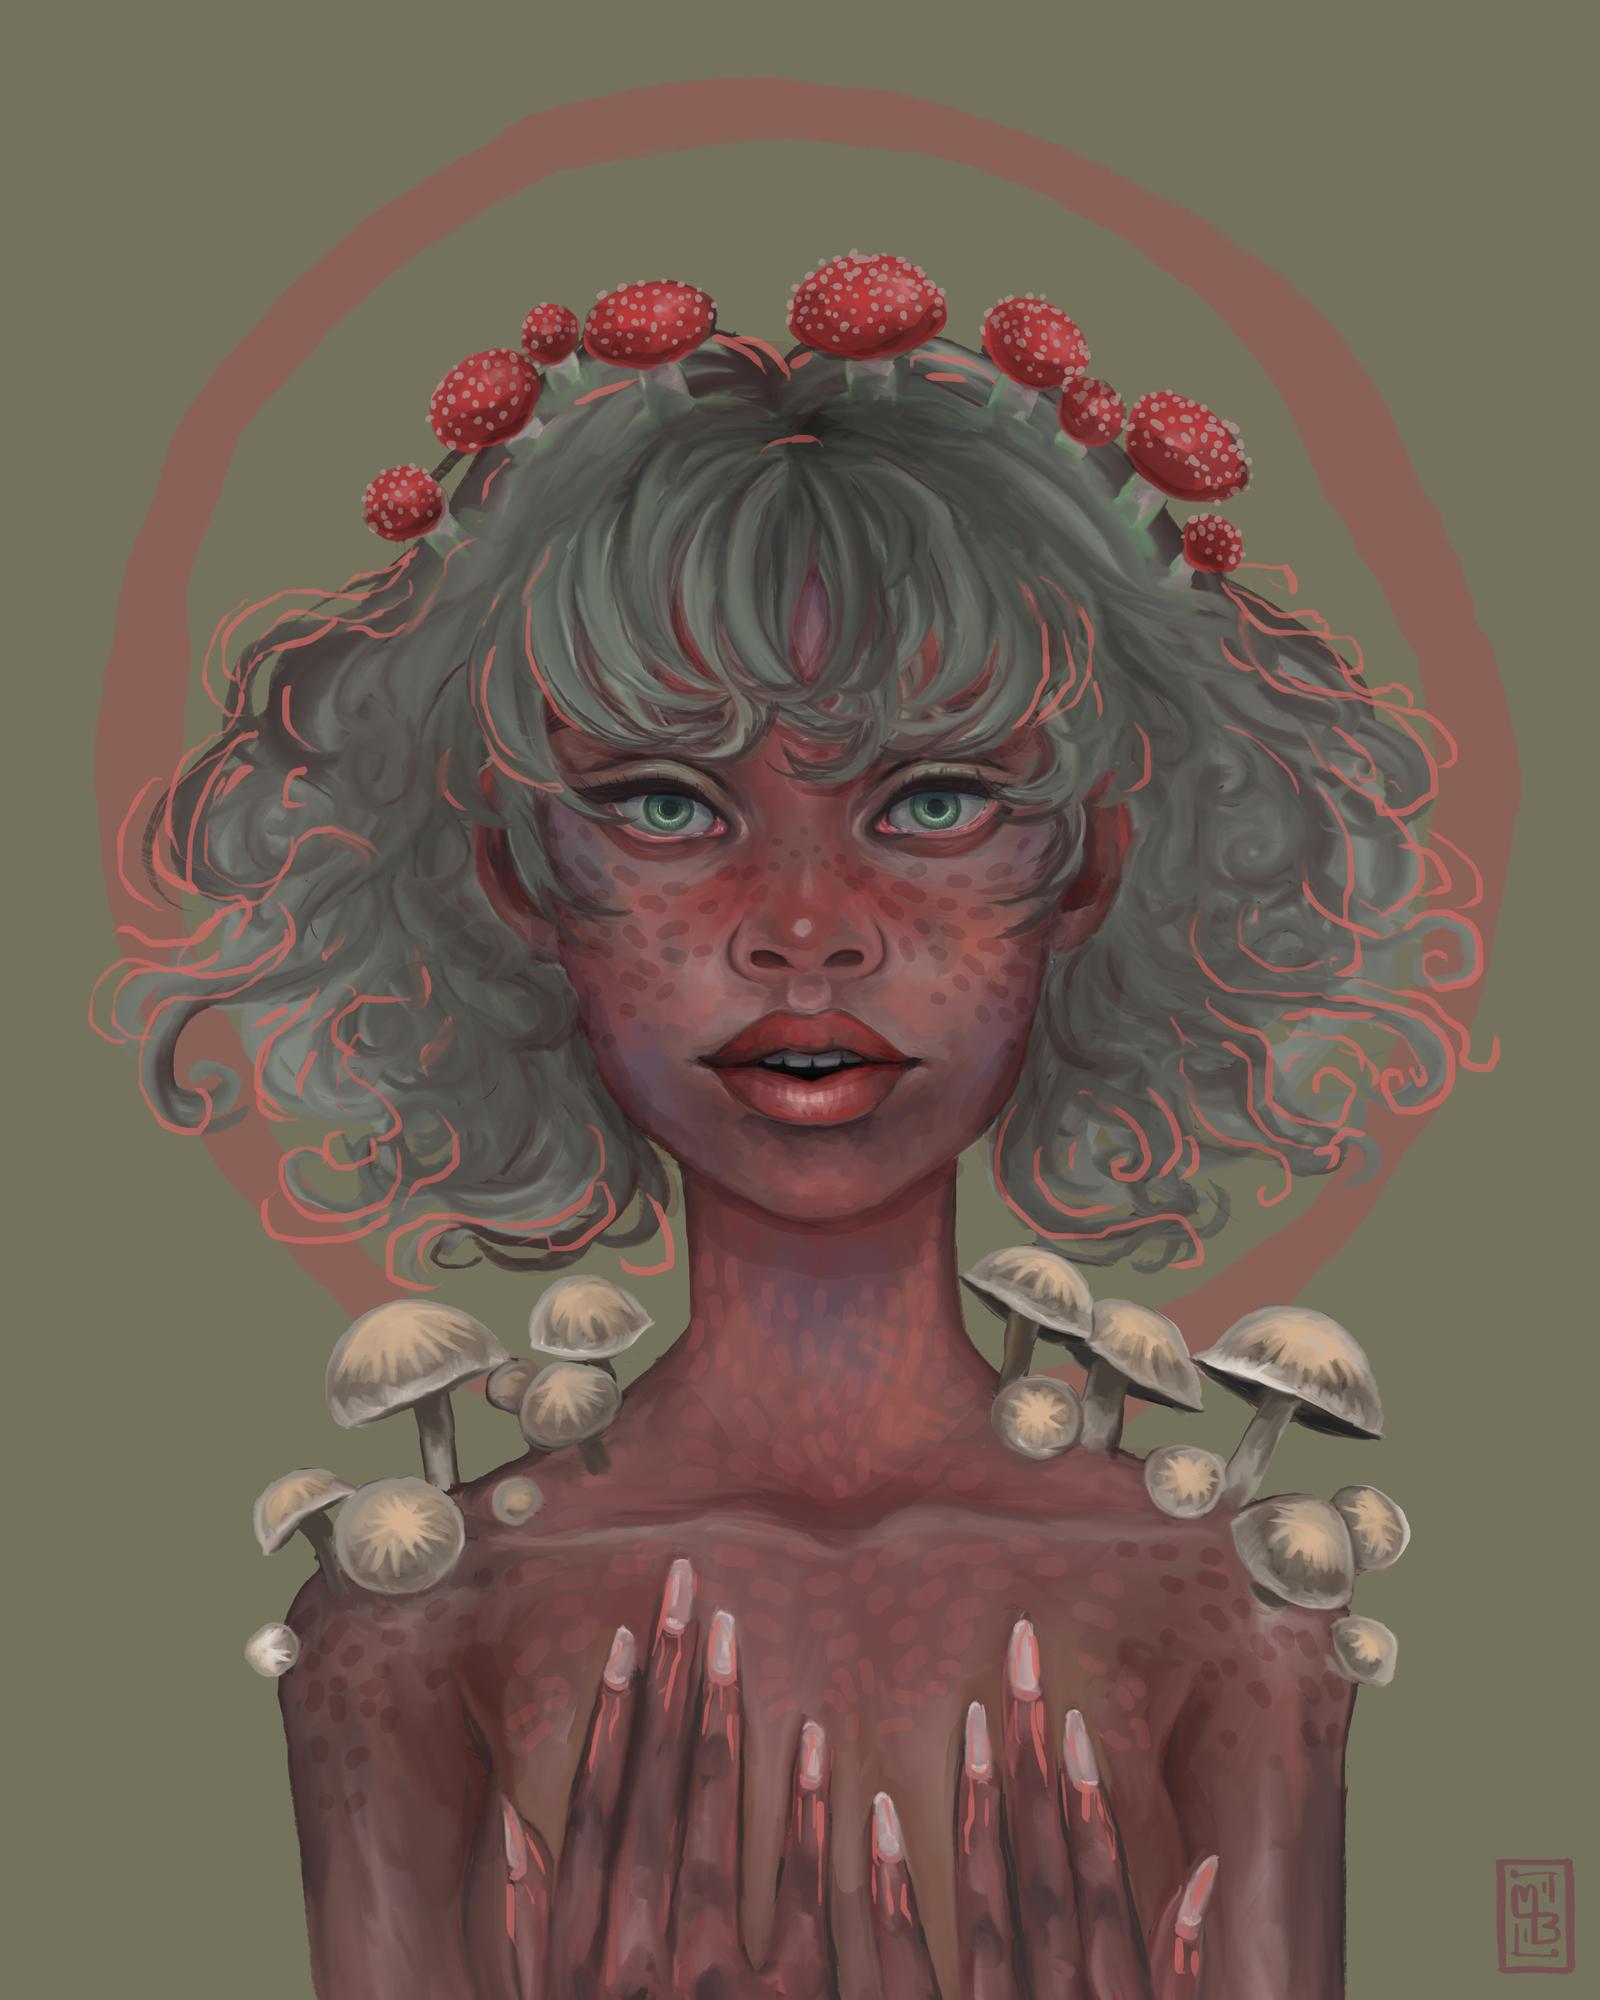 [Image: mushroom_pixie_by_momoreo-d8lw7bb.jpg]